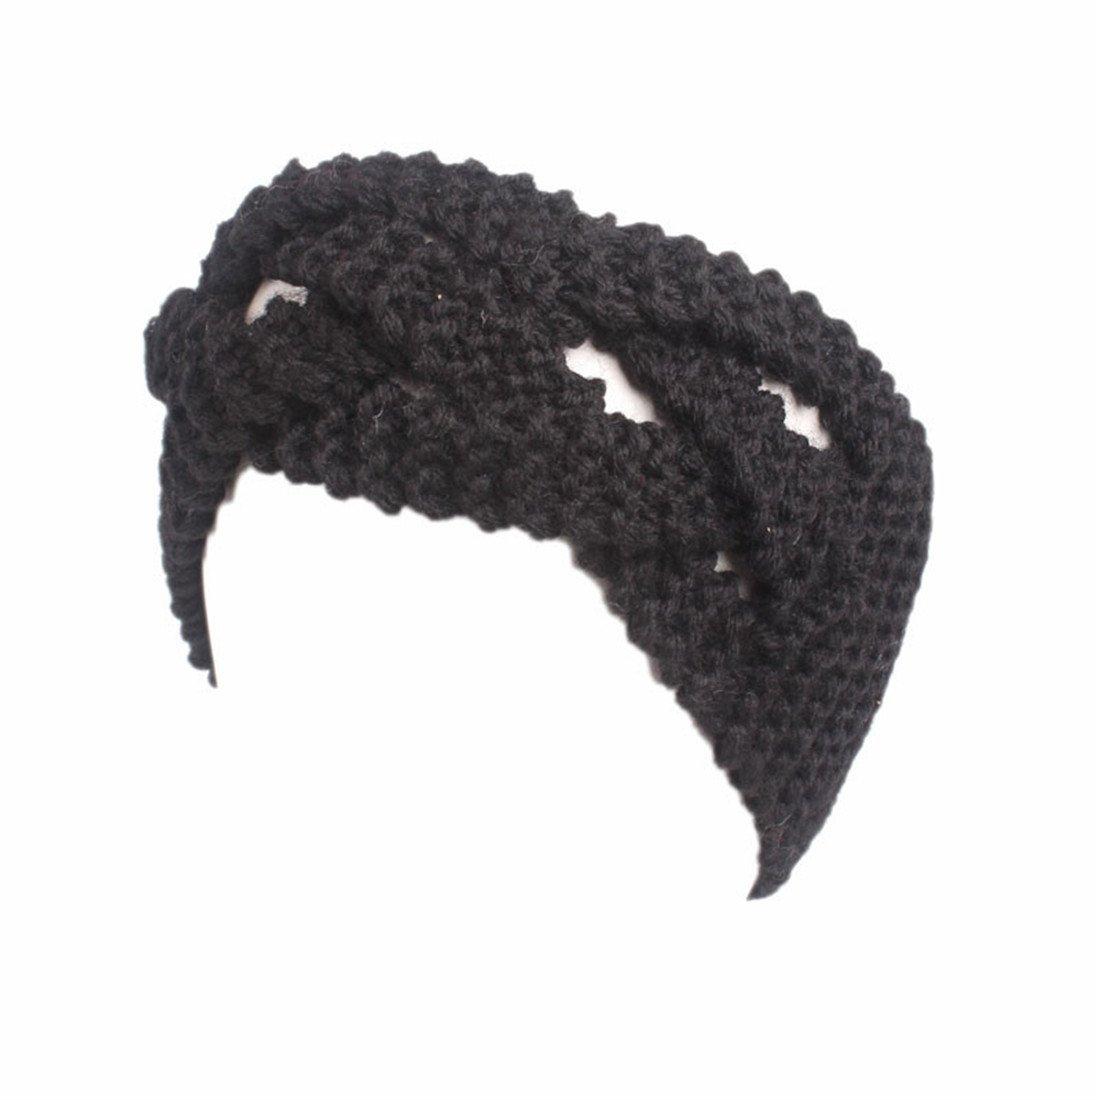 Turbante Hat|lady\'s head hat|crochet artesanal correa de cabeza|Lady ...